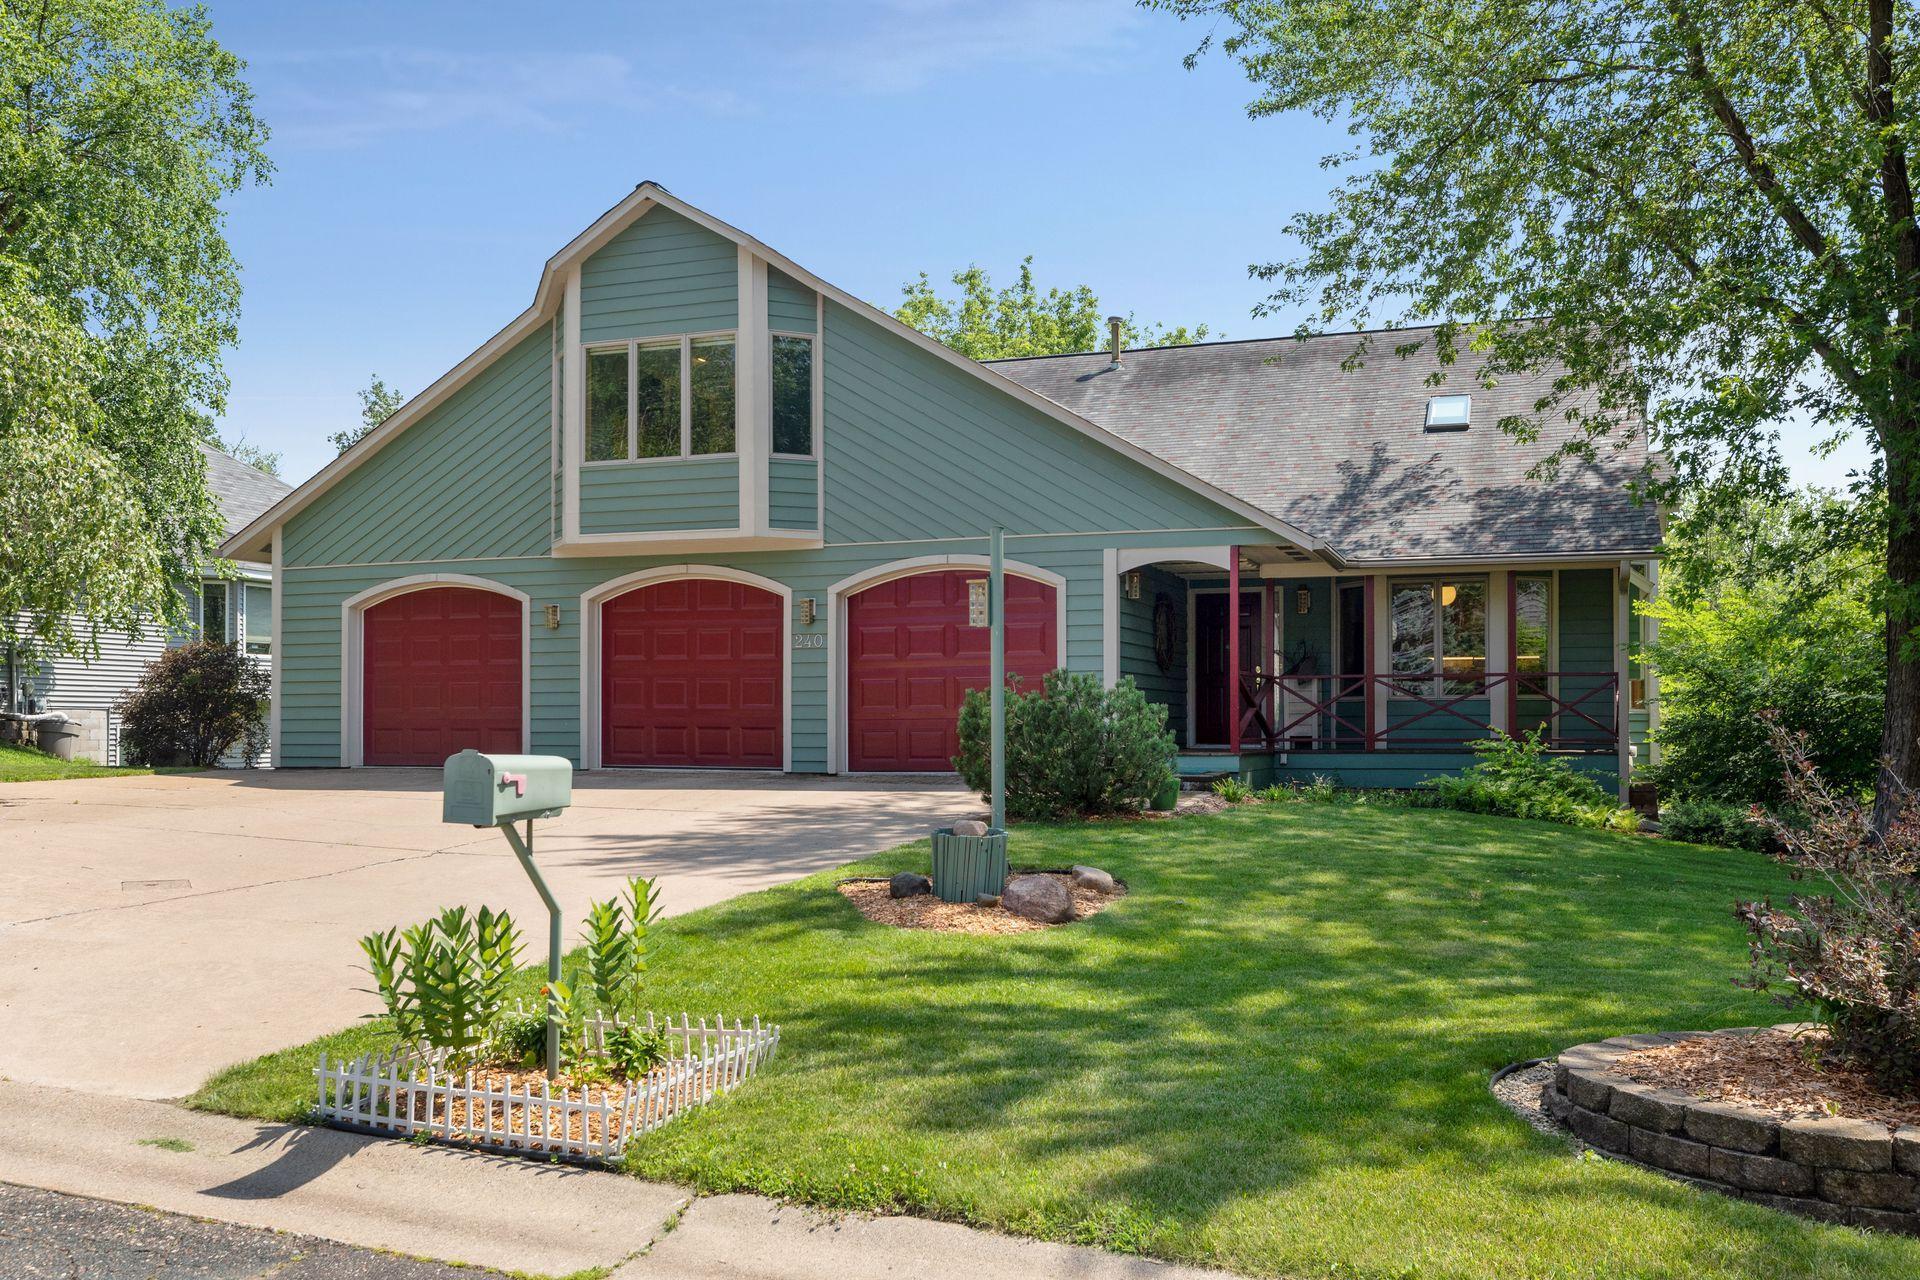 240 Dahlia Property Photo - Mahtomedi, MN real estate listing